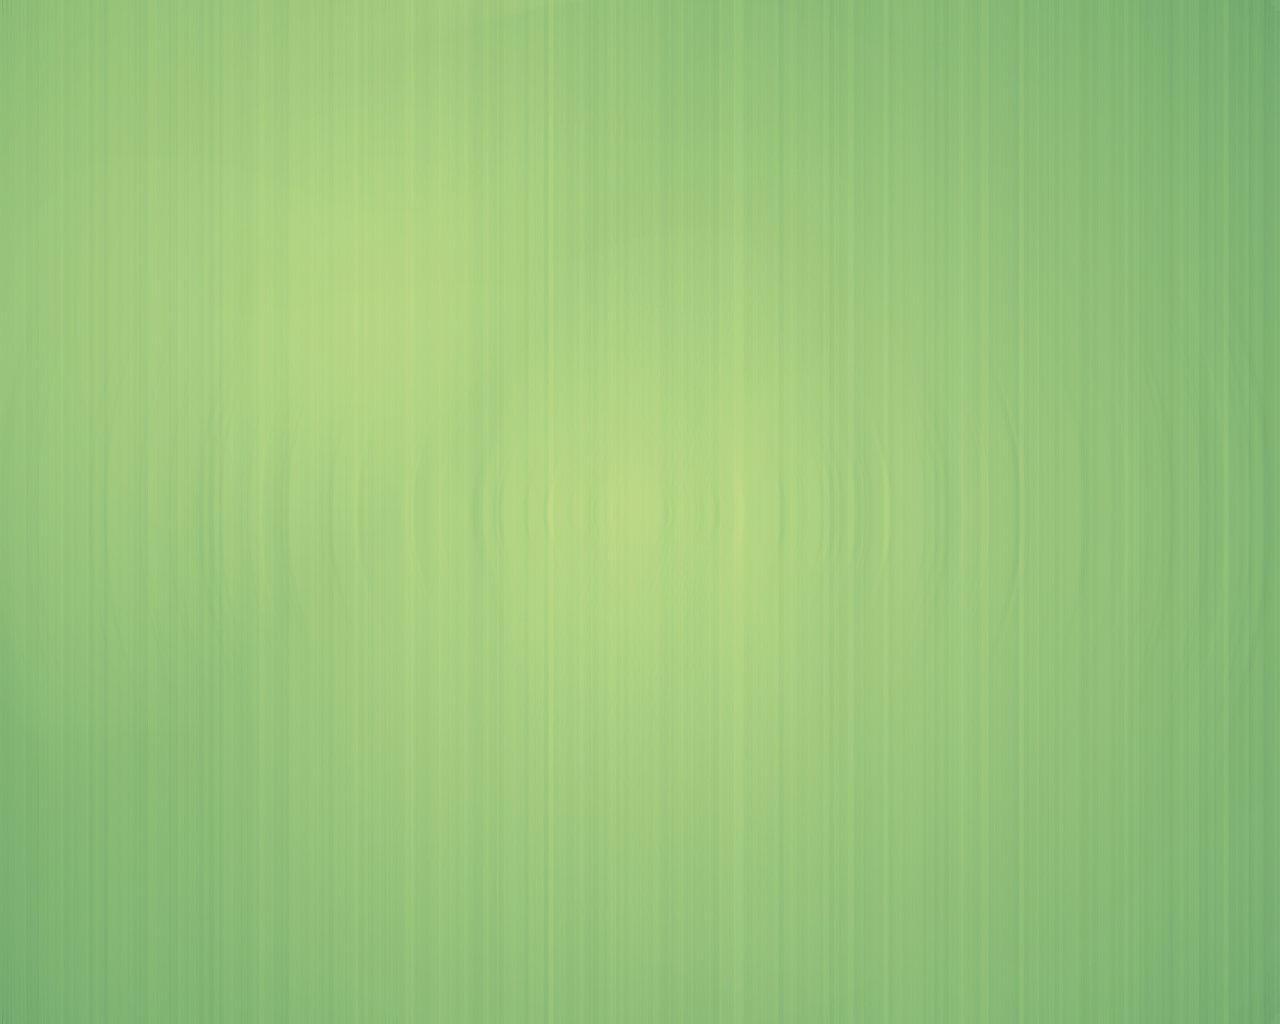 wallpaper stripes green4 by 10r